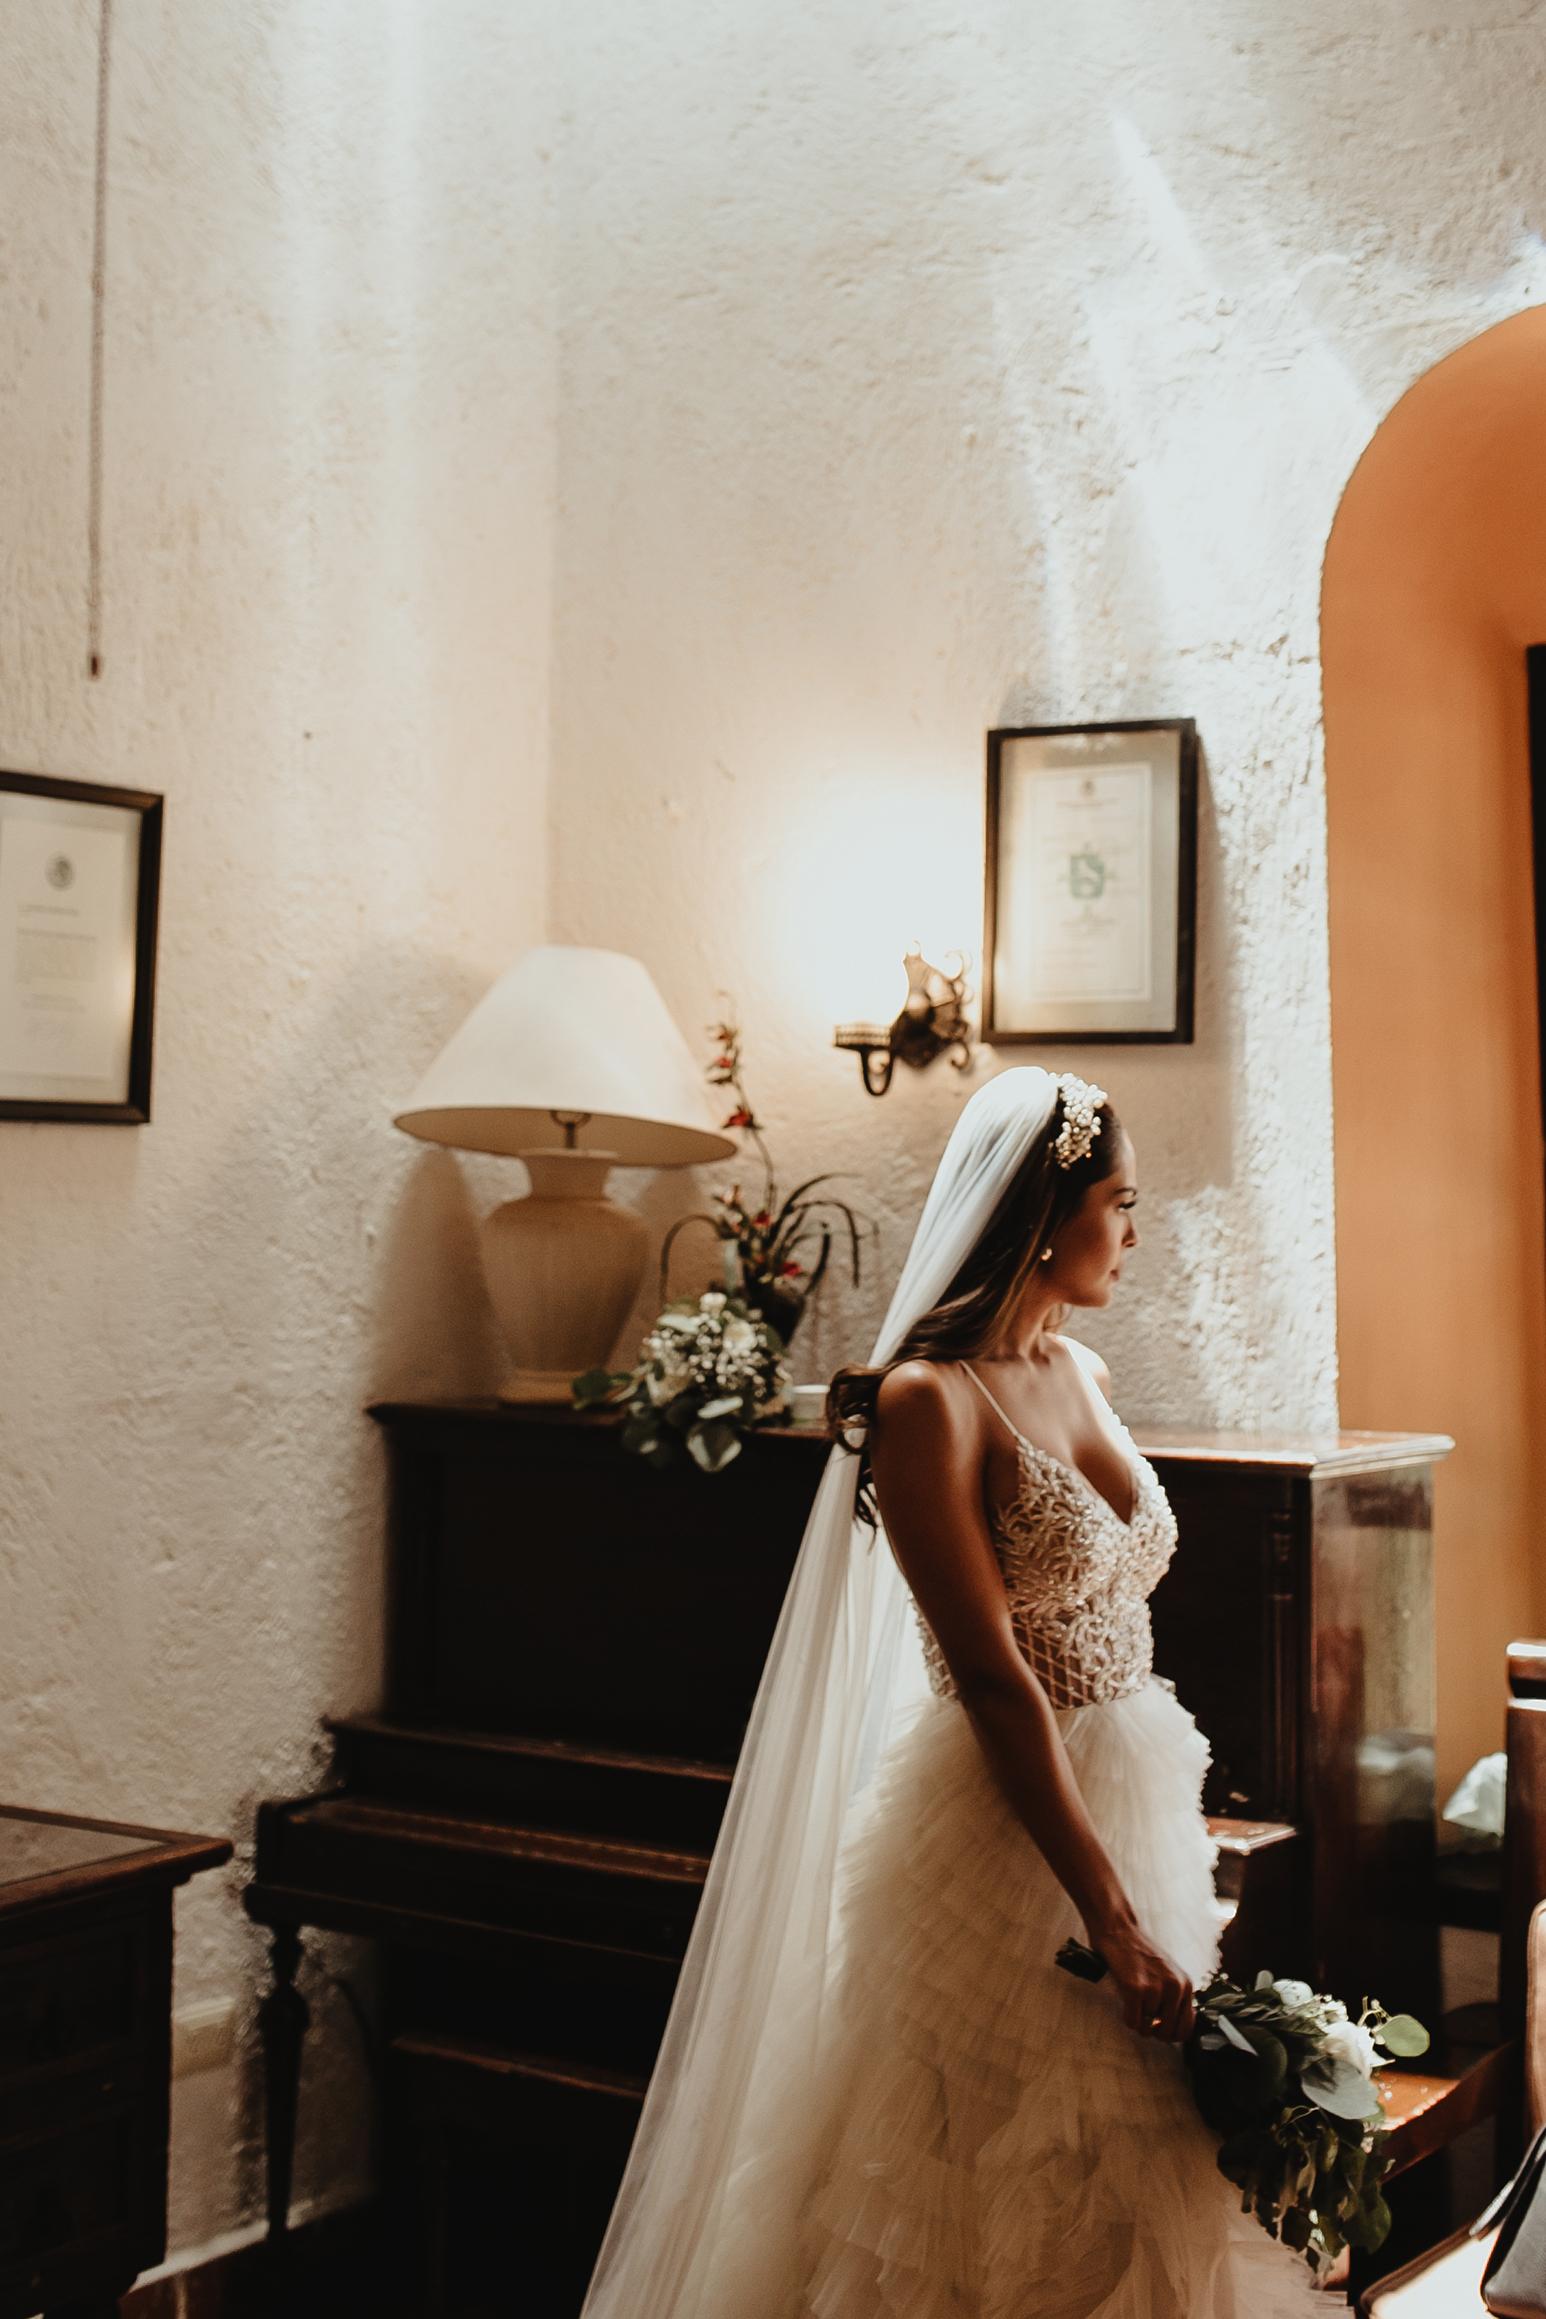 0128R&F__WeddingDestination_Weddingmerida_BodaMexico_FotografoDeBodas_FabrizioSimoneenFotografo.jpg